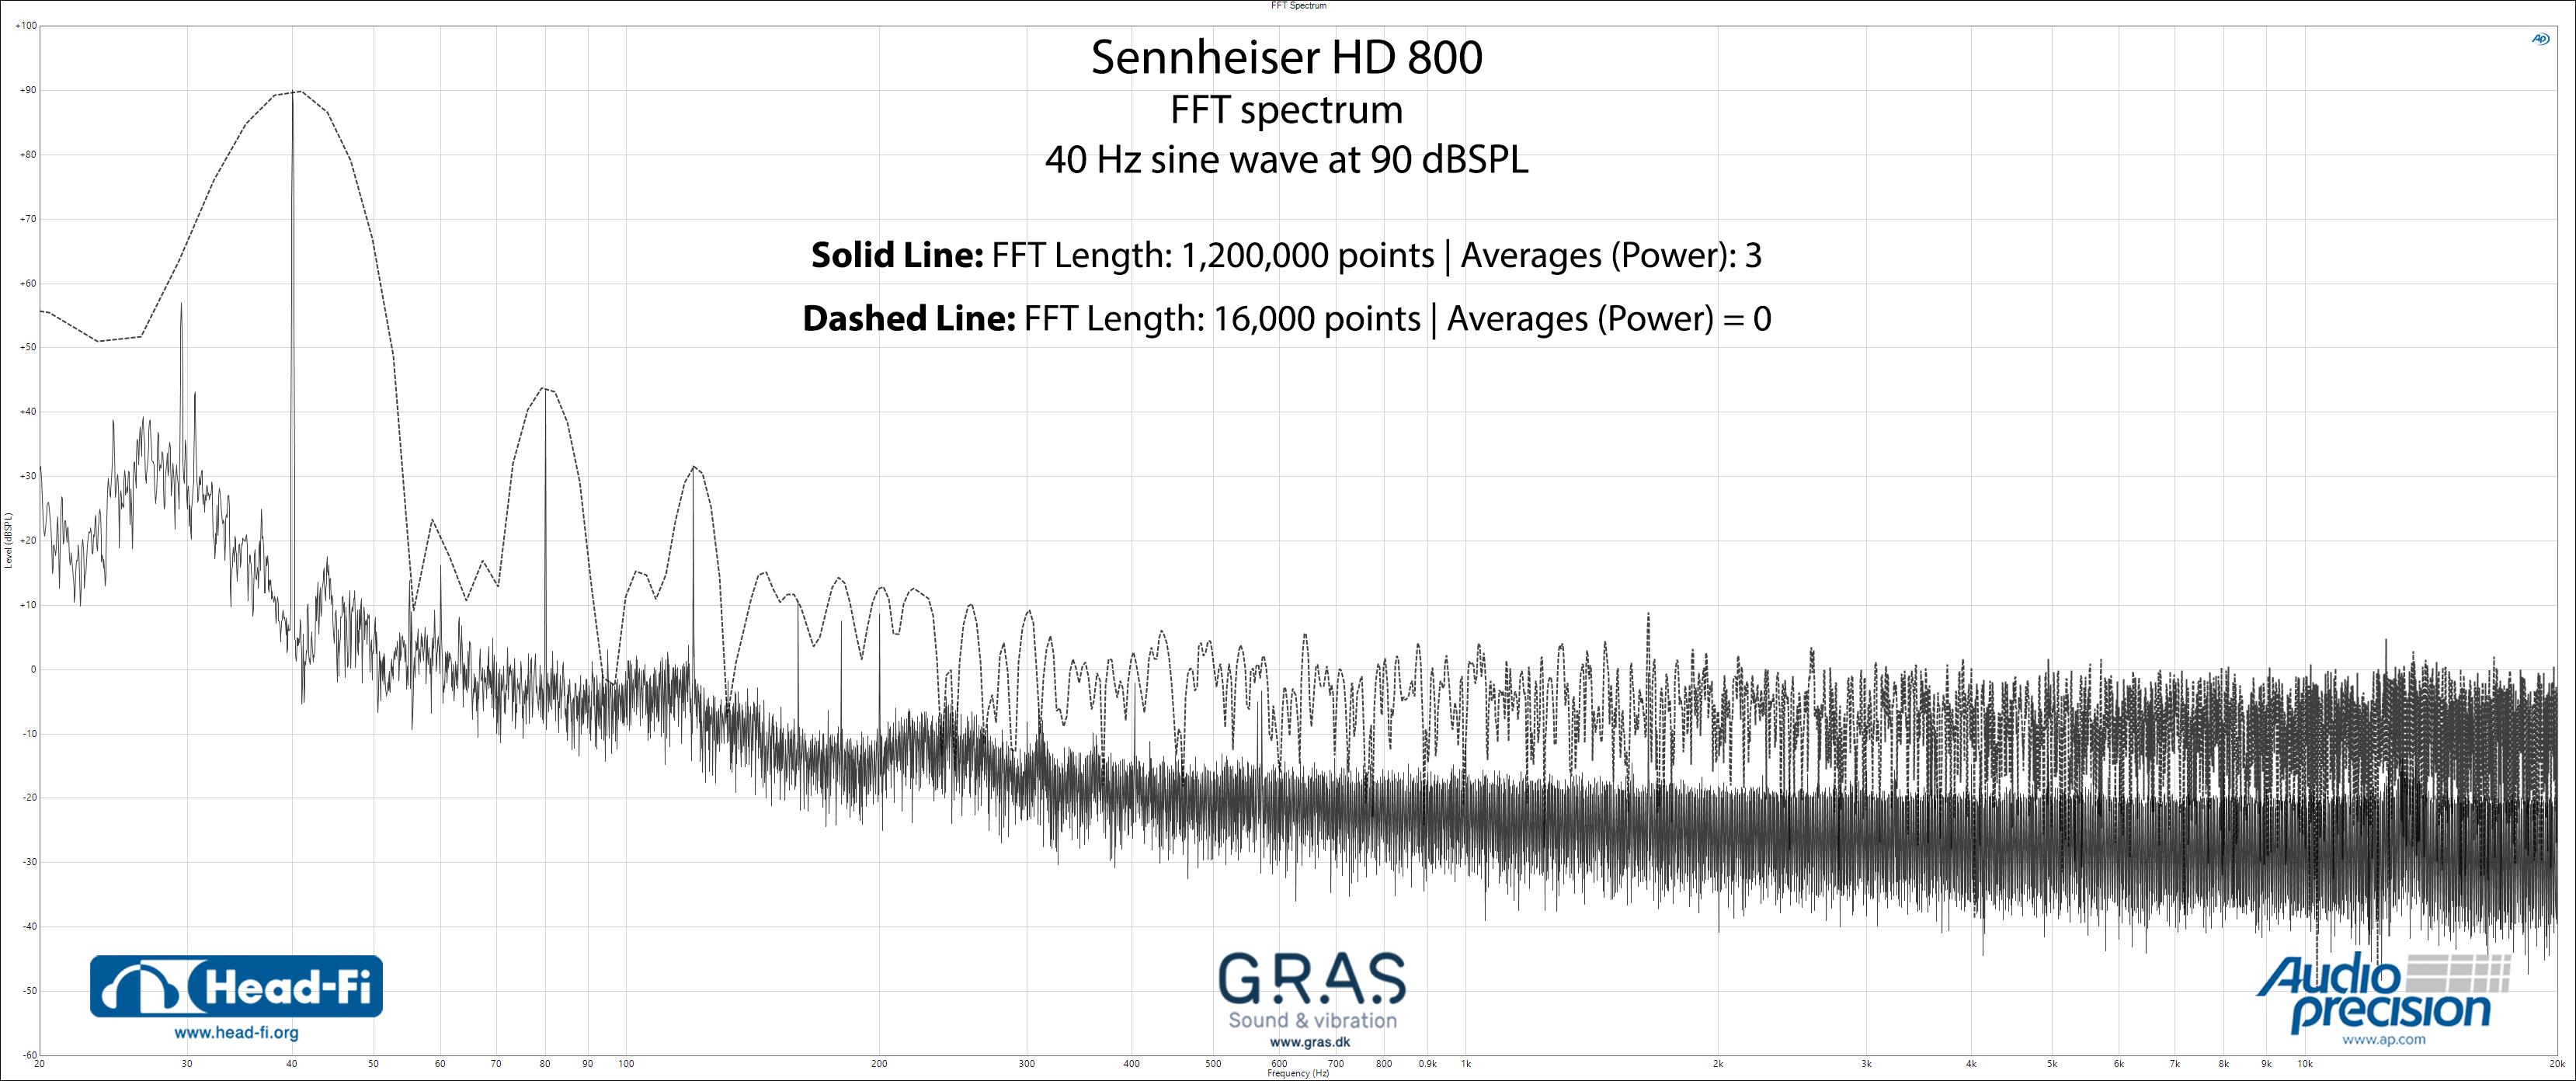 FFT-Spectrum---16000-points---no-average-AND-1.2M-points-average-3.jpg